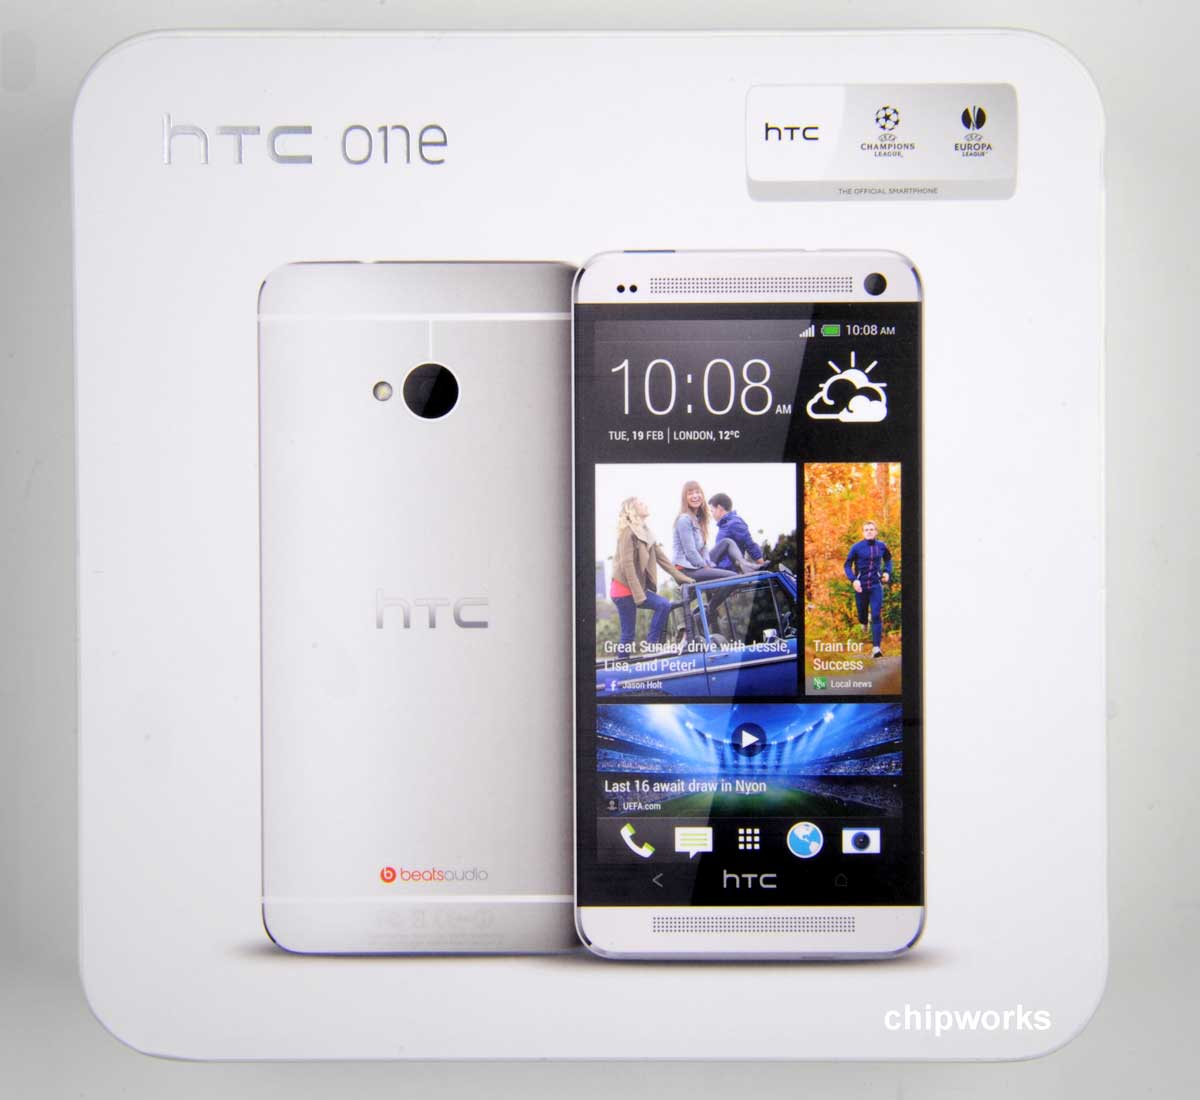 HTC-One-Devicepkg